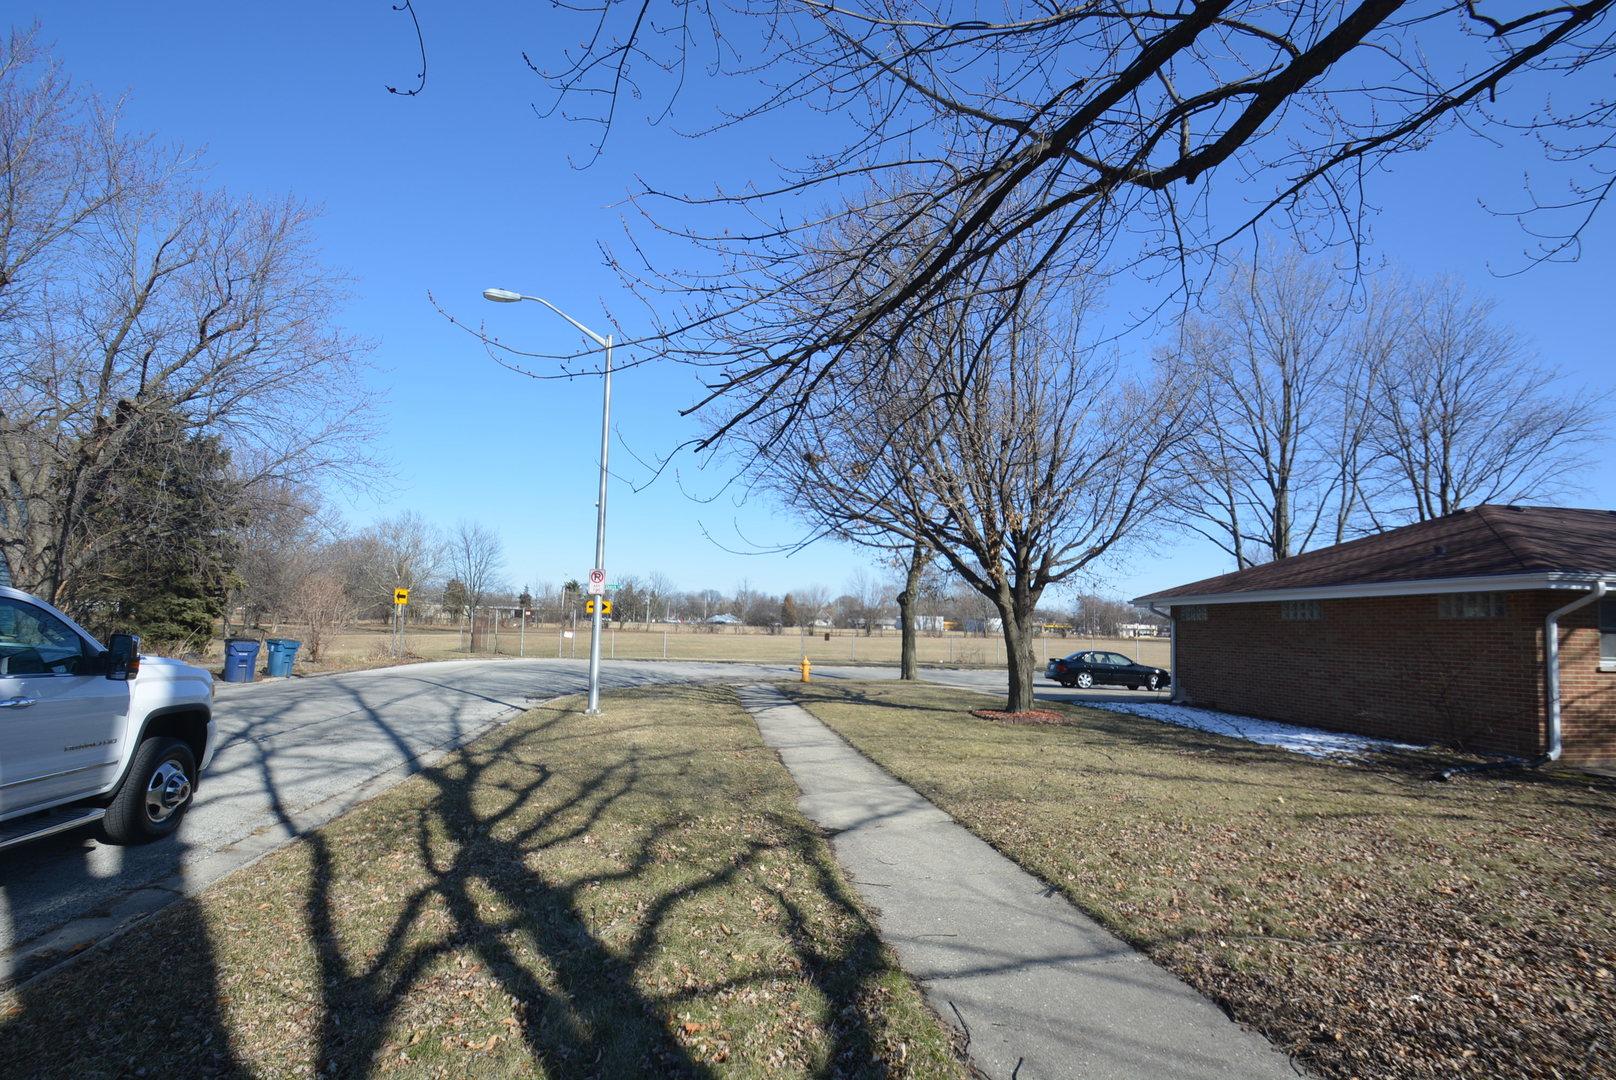 Lot 3 North Church Street, Addison, IL - USA (photo 2)